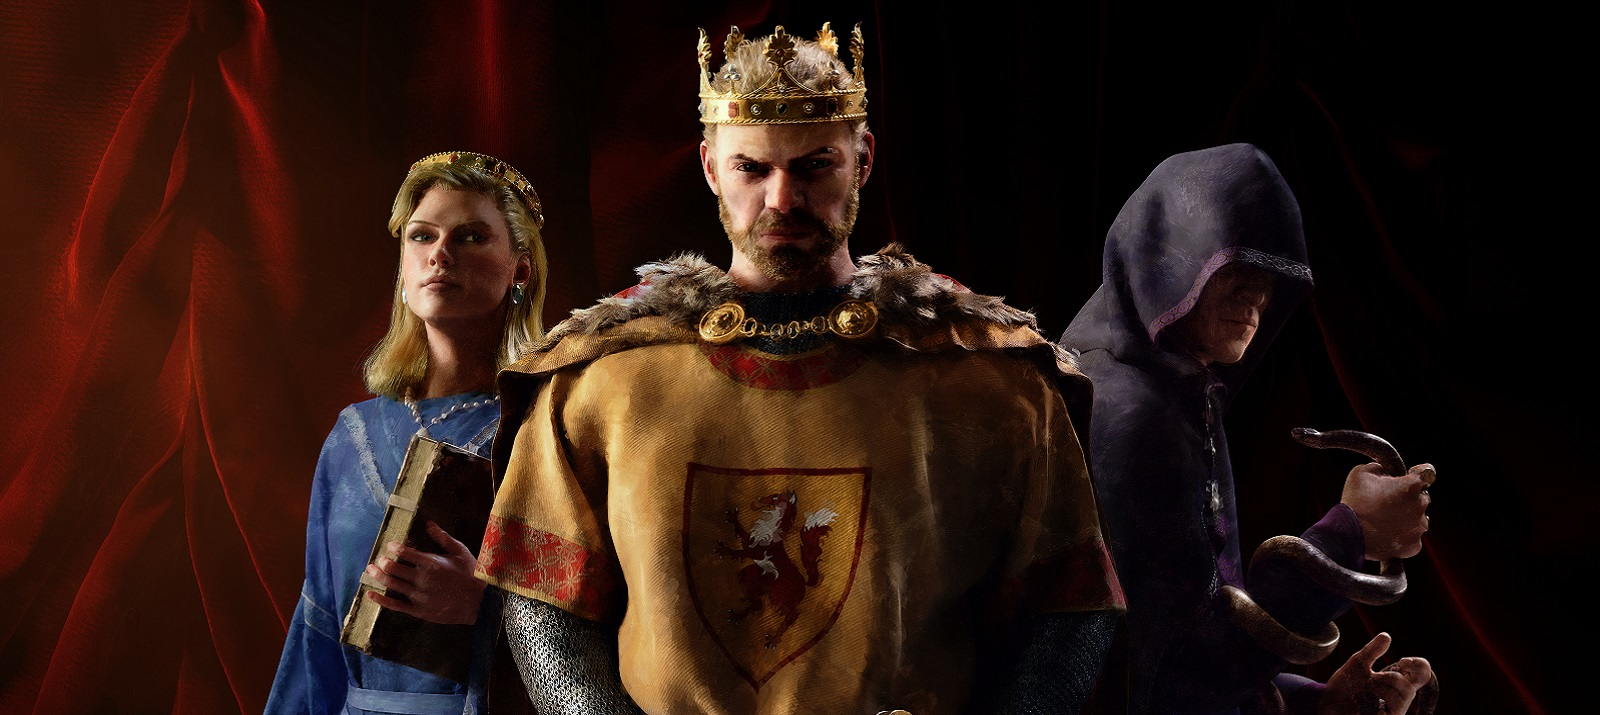 Качественная эволюция: превью Crusaders Kings 3